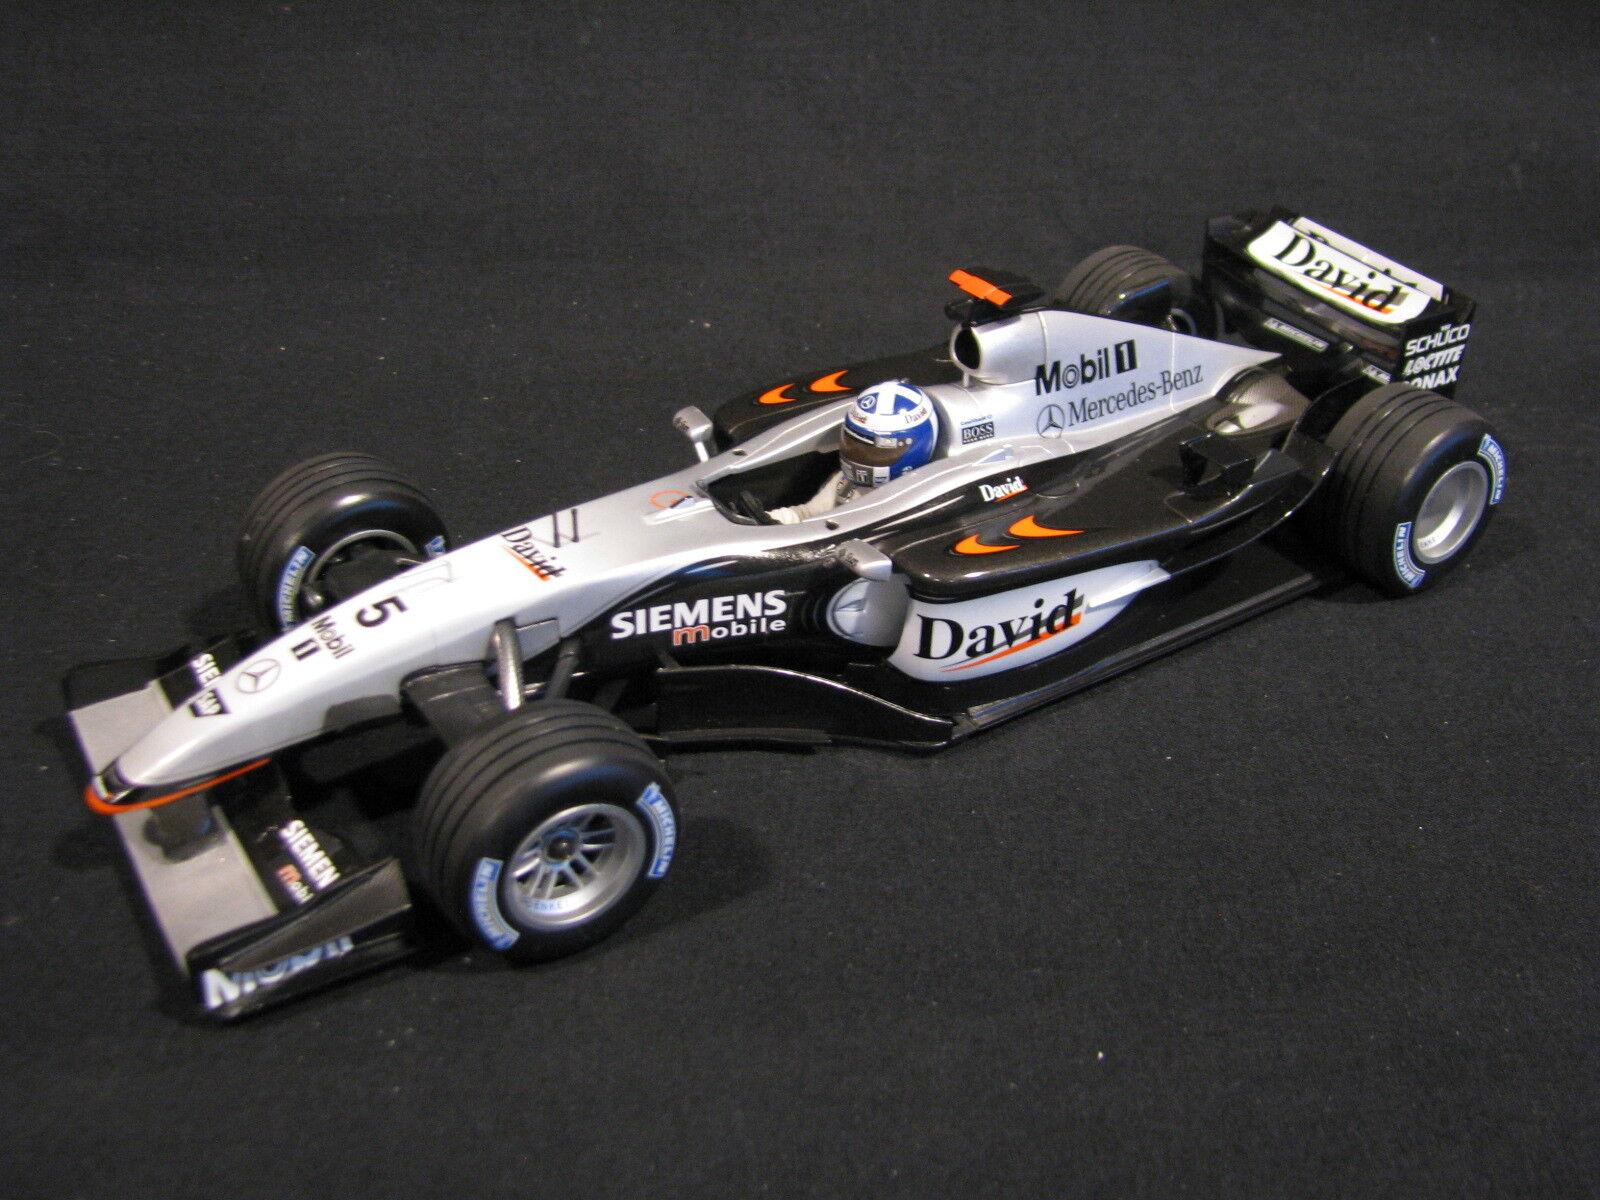 grandes ahorros Minichamps McLaren Mercedes MP4 17D 2003 1 18 18 18  5 David Coulthard (GBR) (JvM)  tienda de descuento